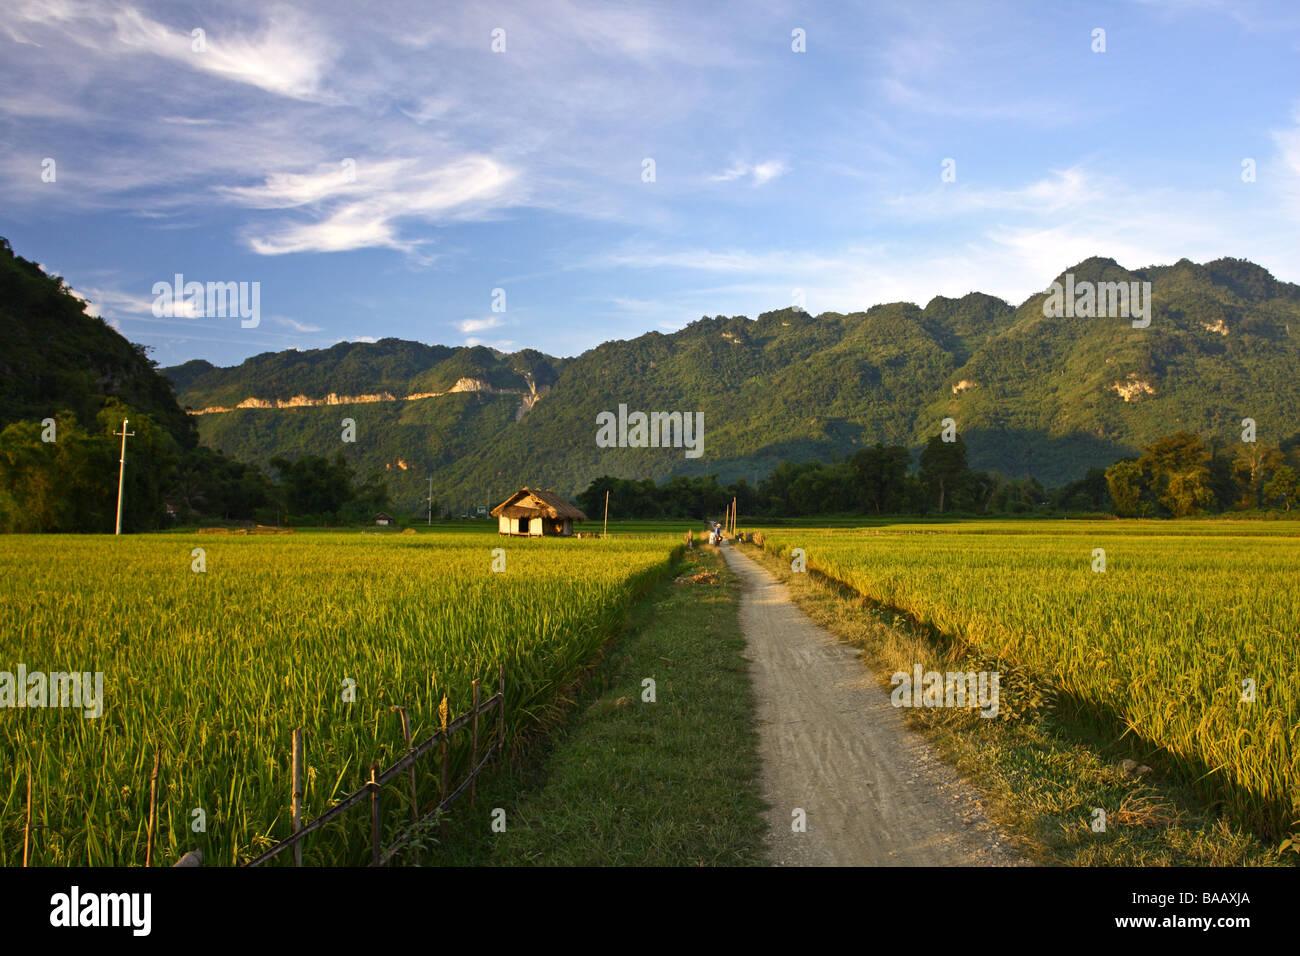 Beautiful landscape with green mountains, rice fileds around Mai Chau minority village. Vietnam - Stock Image